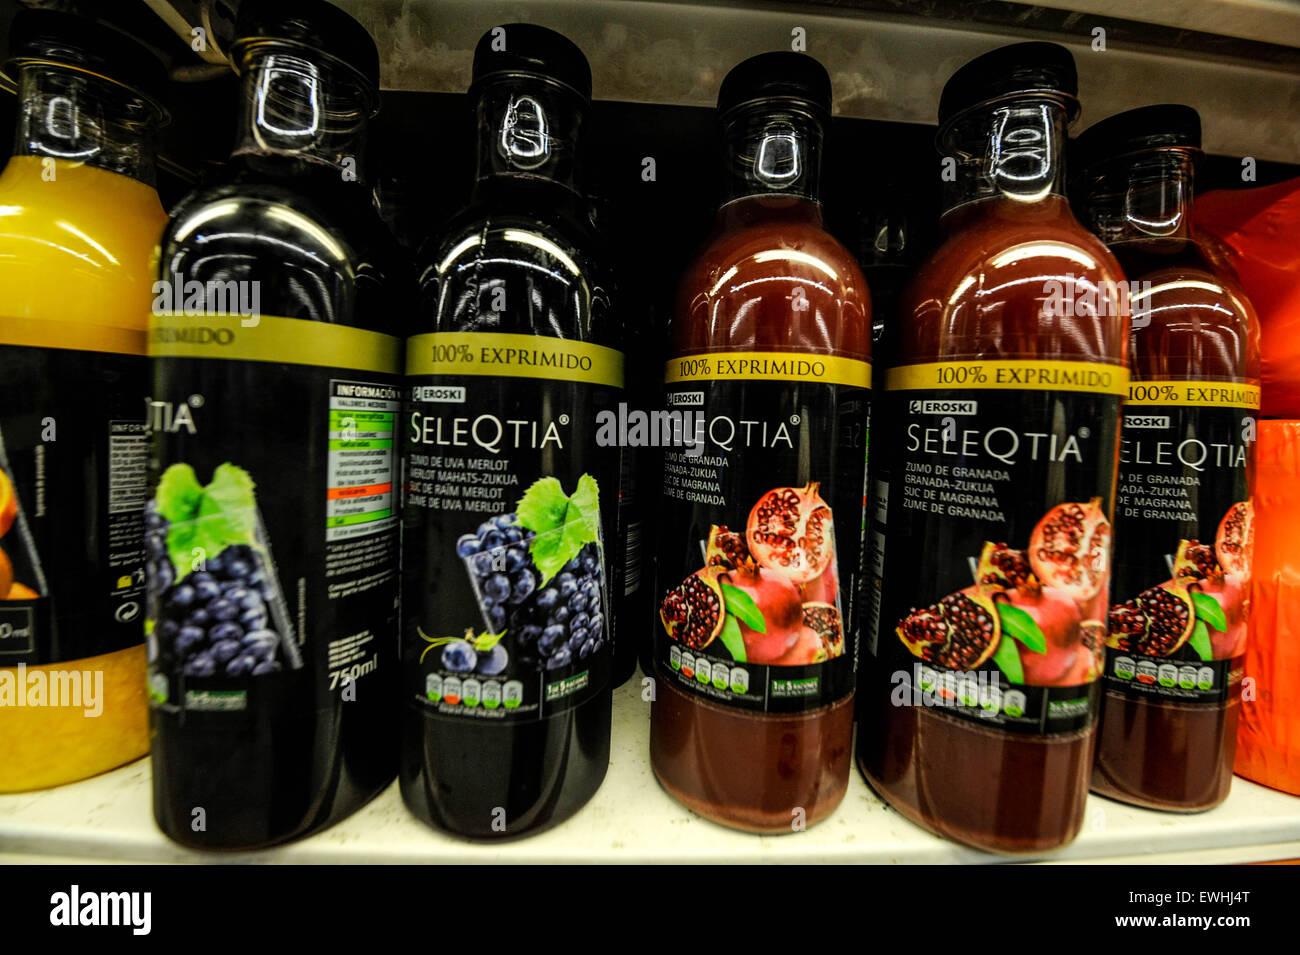 Seleqtia Juices - Stock Image